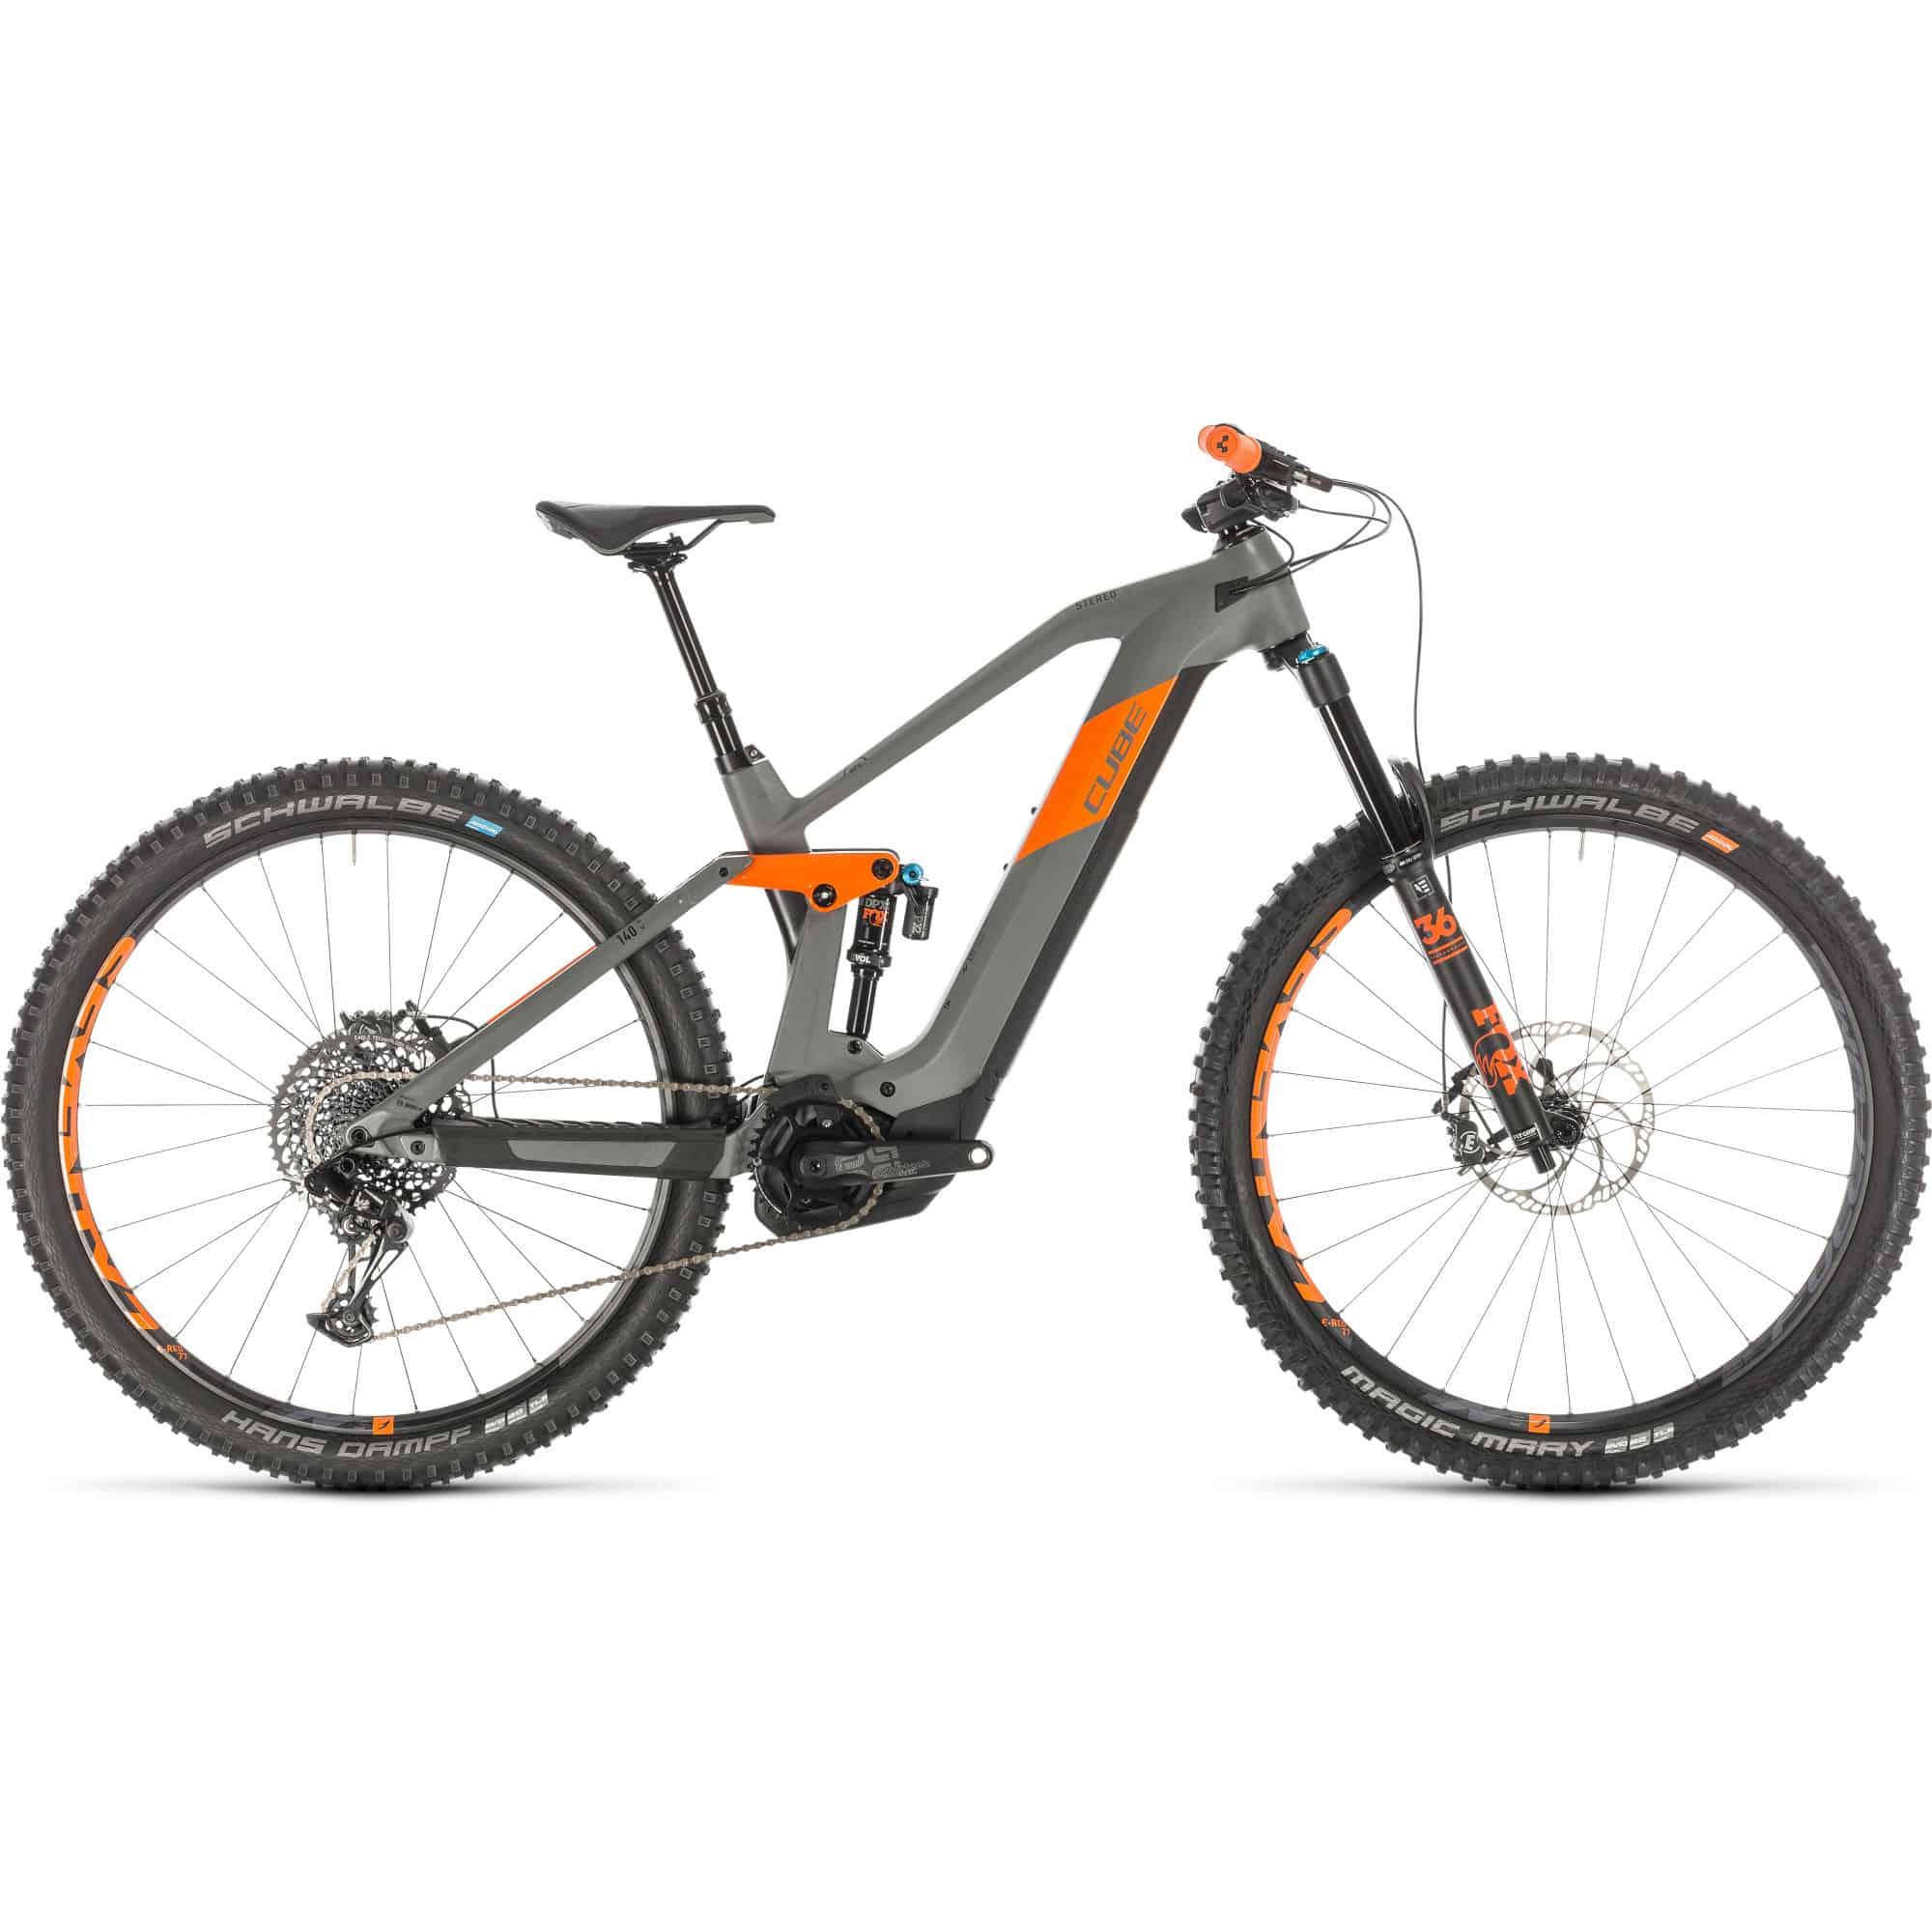 cube stereo 140 hpc hybrid TM 625 29 electric bike 2020